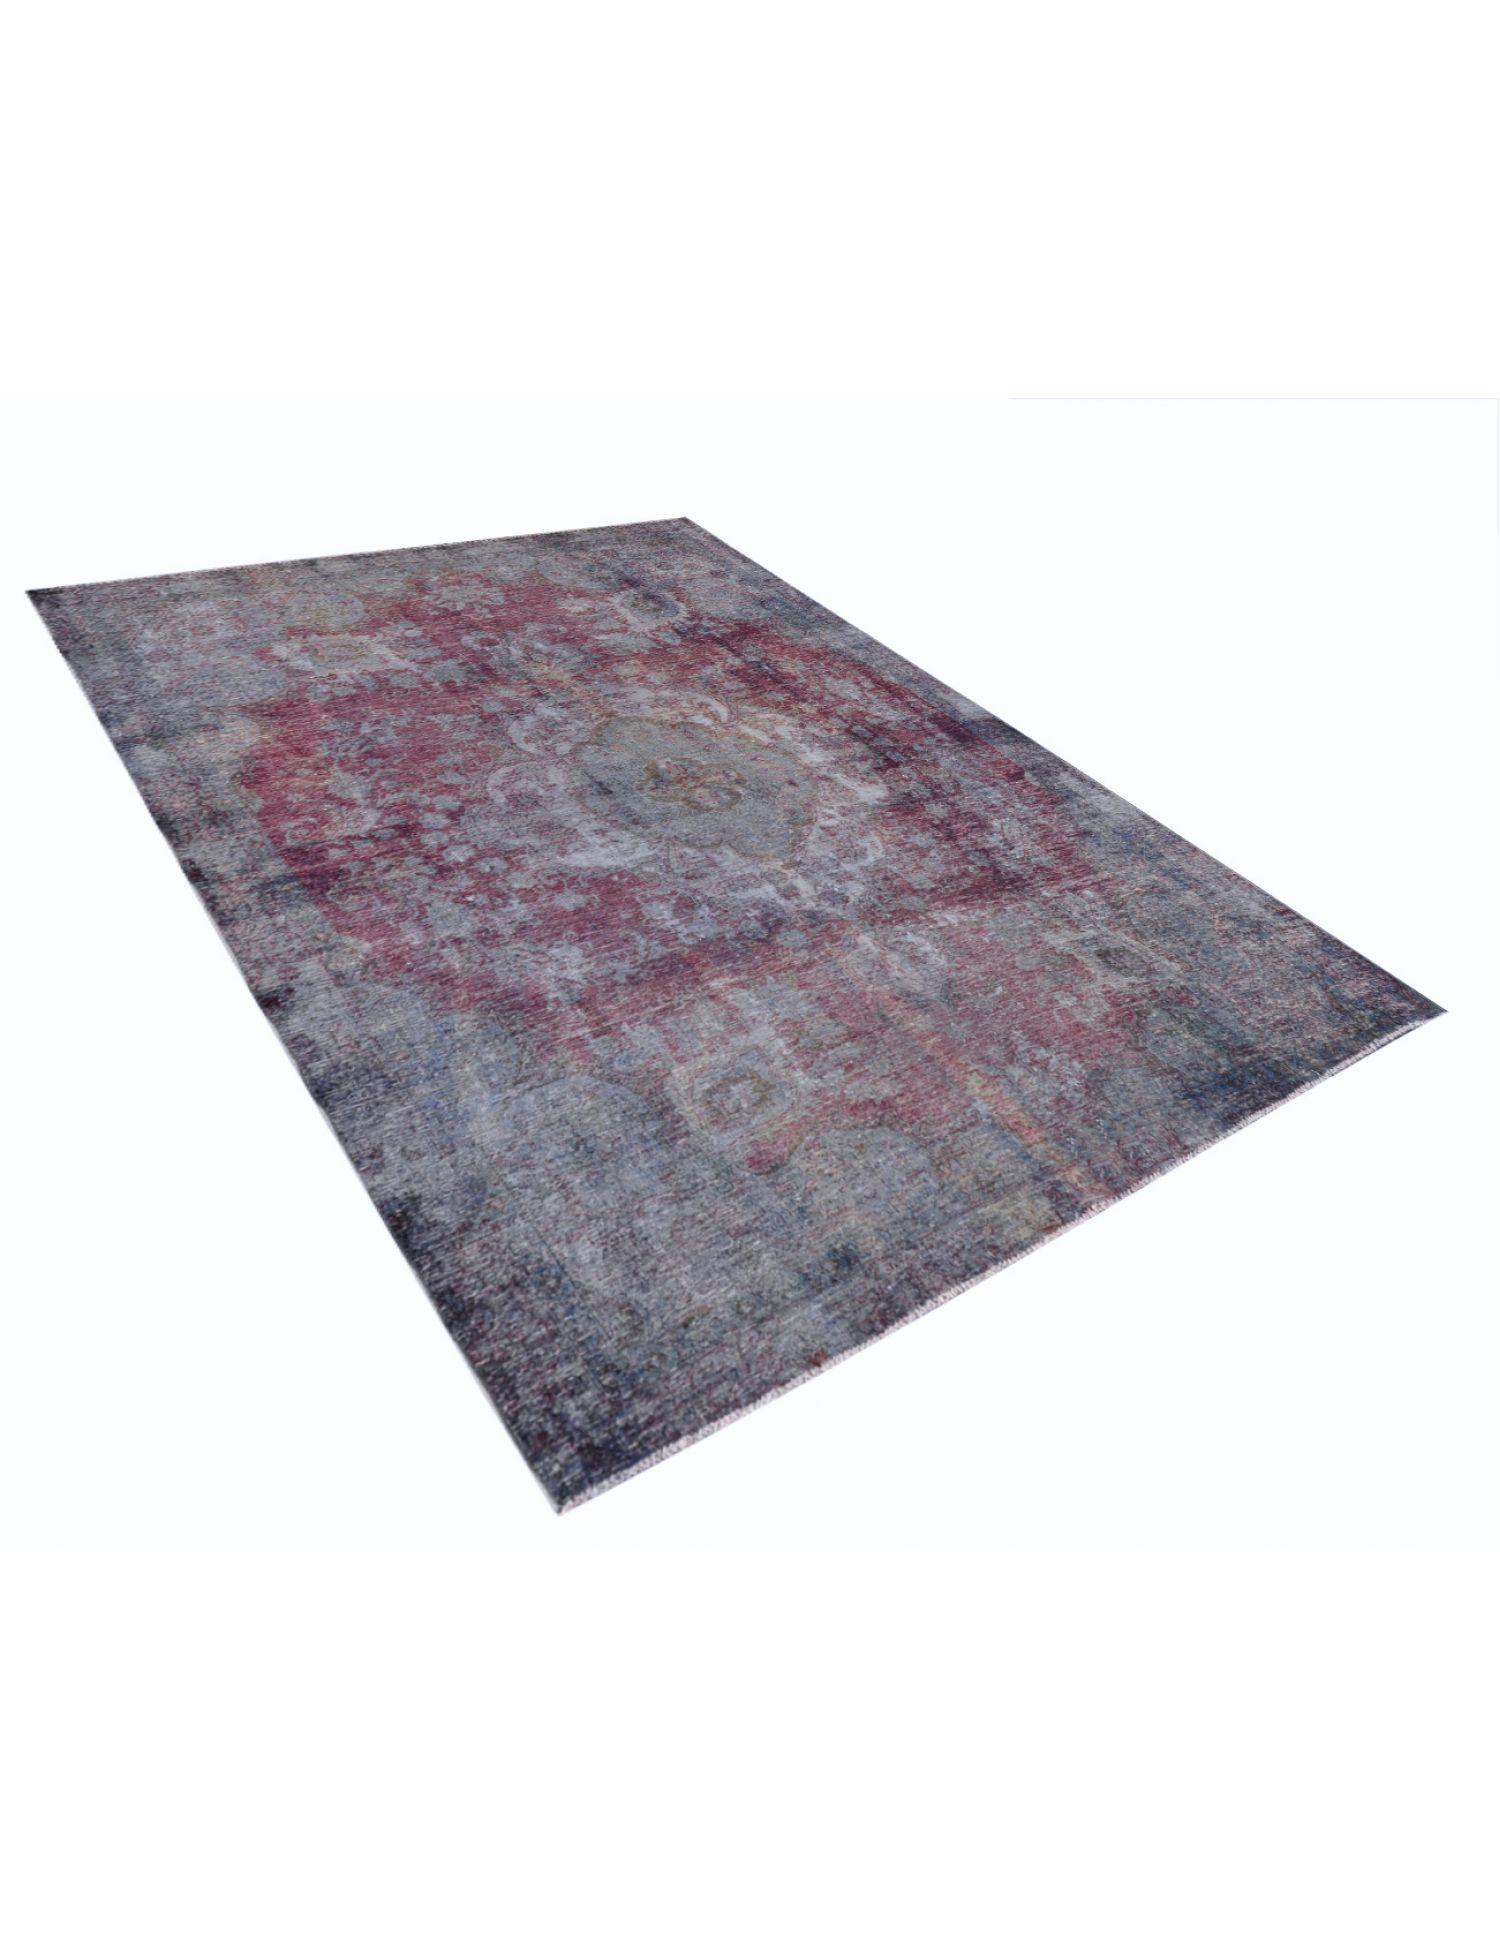 Vintage Carpet  grey <br/>345 x 268 cm